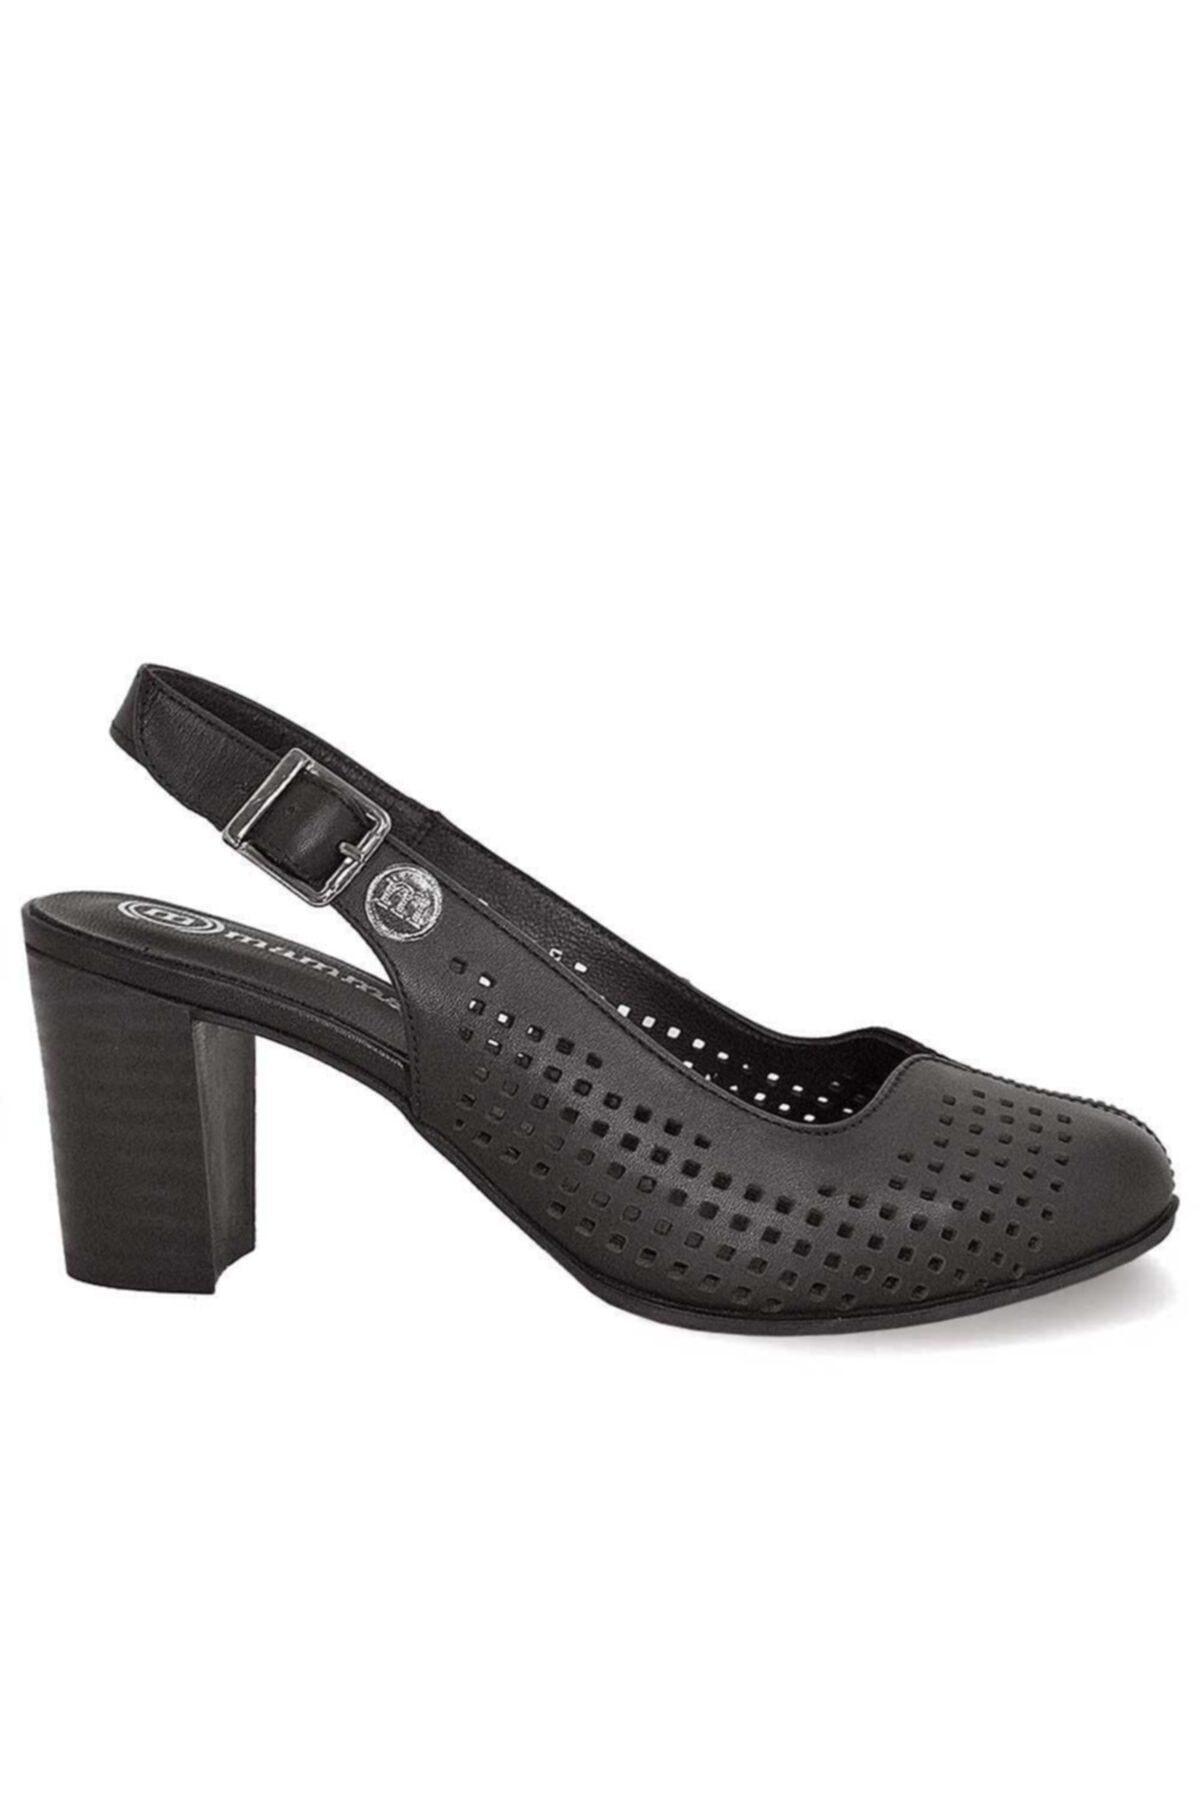 Mammamia Kadın  Topuklu Ayakkabı 2